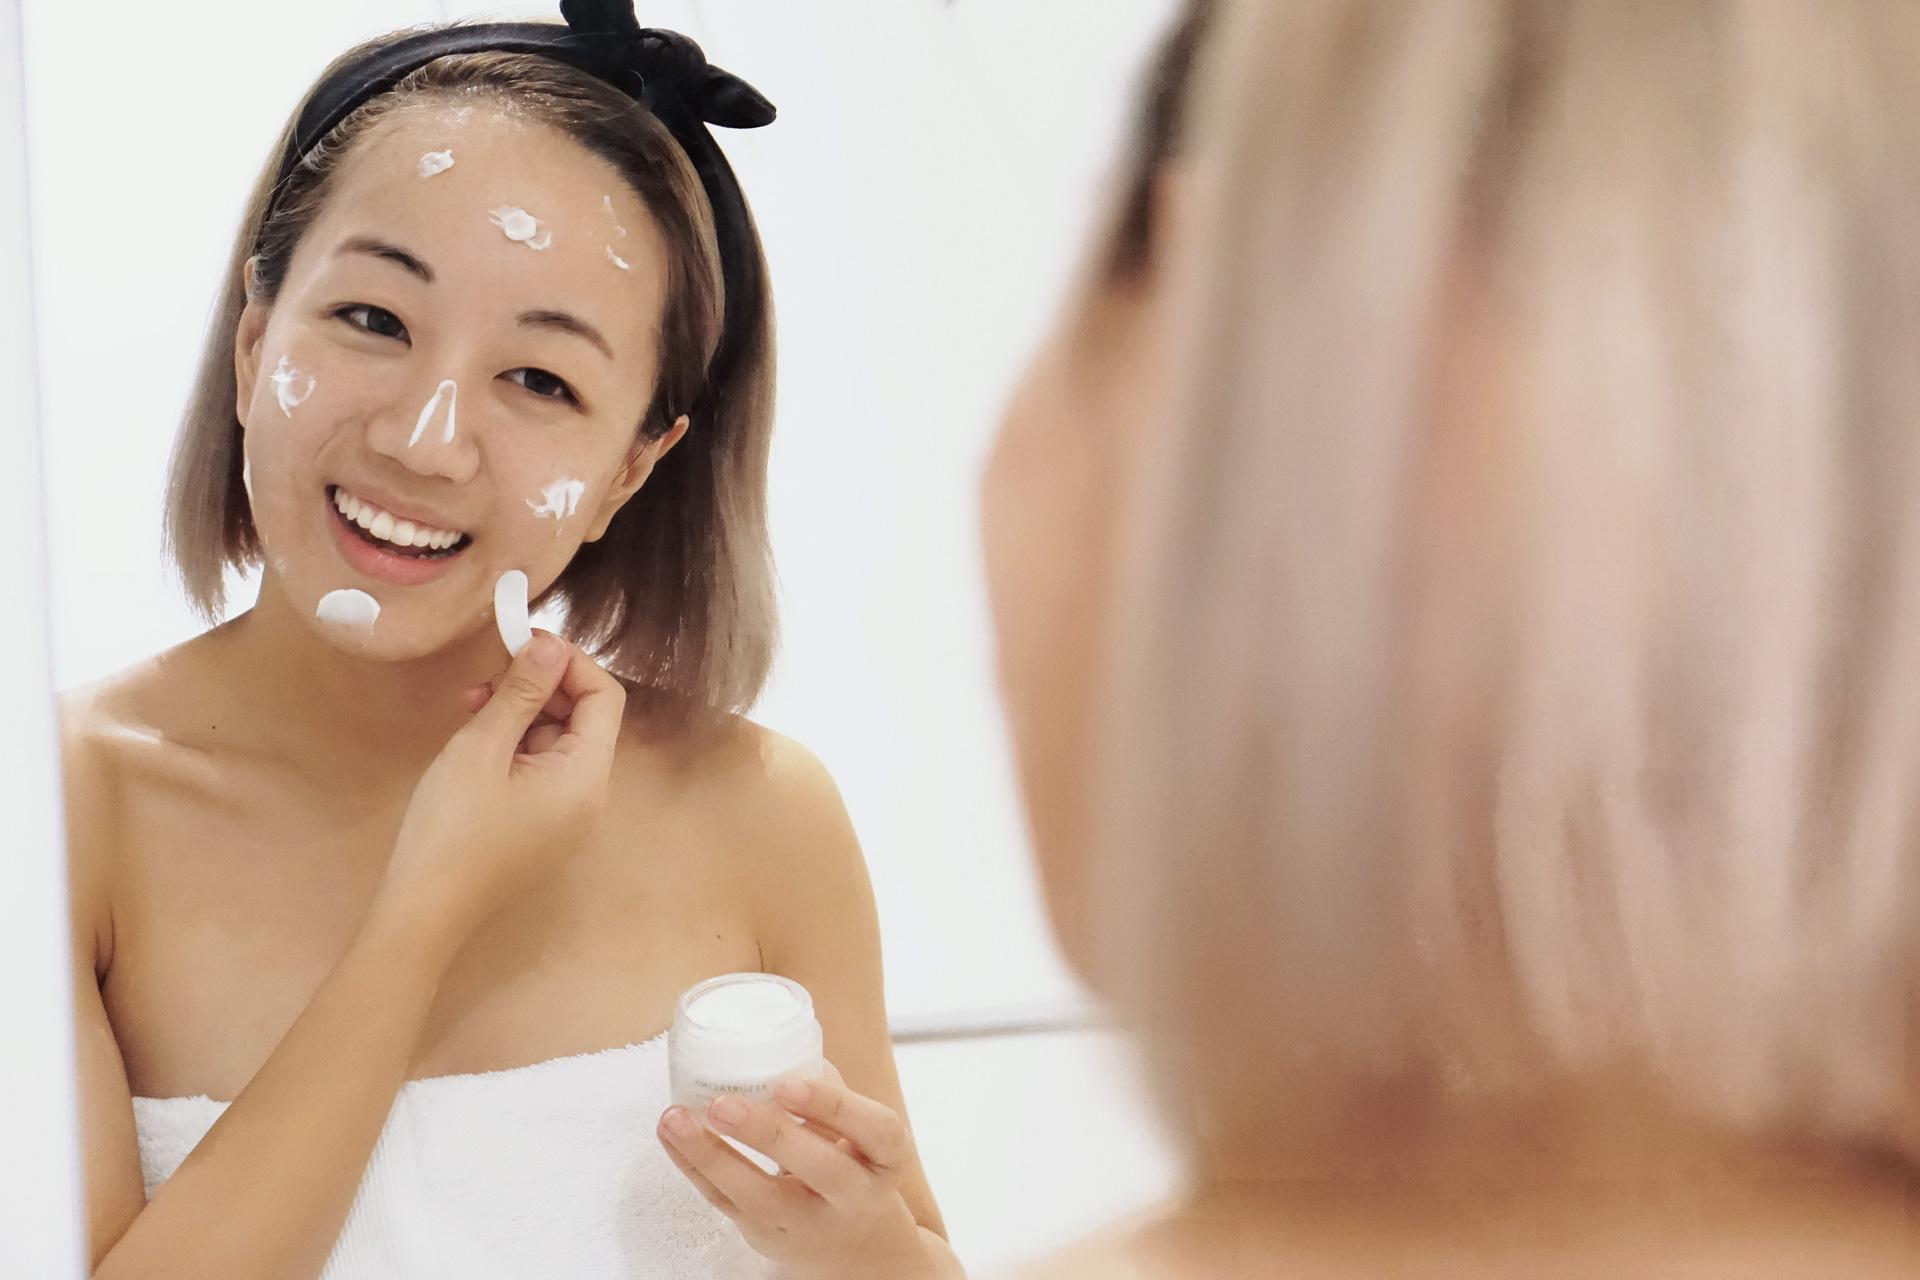 Vikkipedia-Born-Unready-Skincare-Review-Img1-3x2